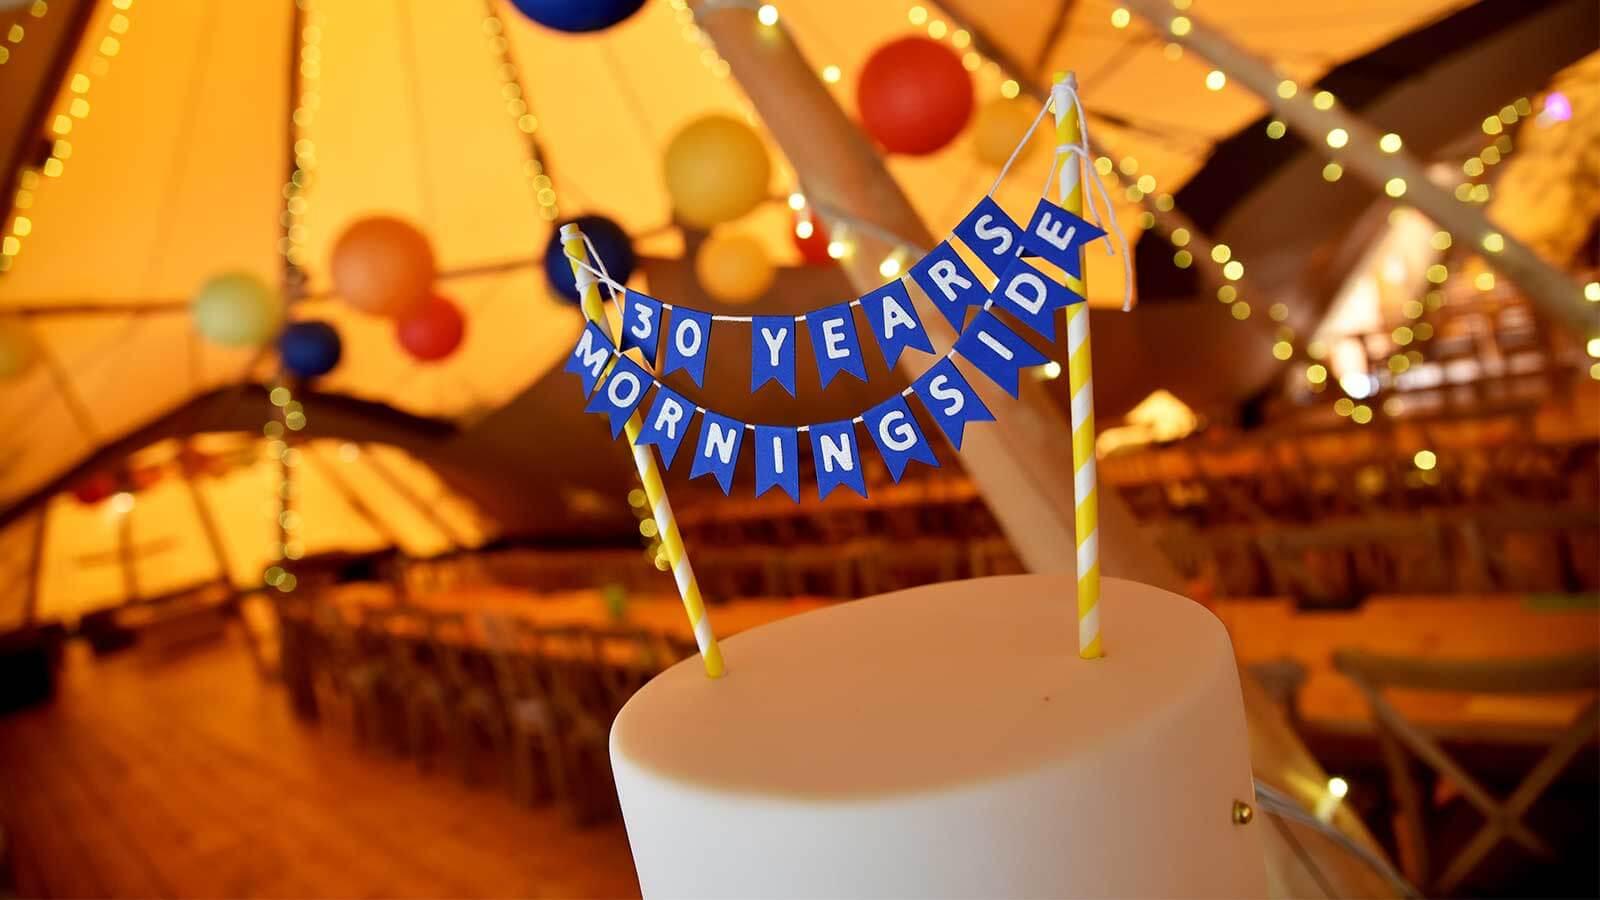 Morningside Pharmaceuticals 30th Anniversary Celebration